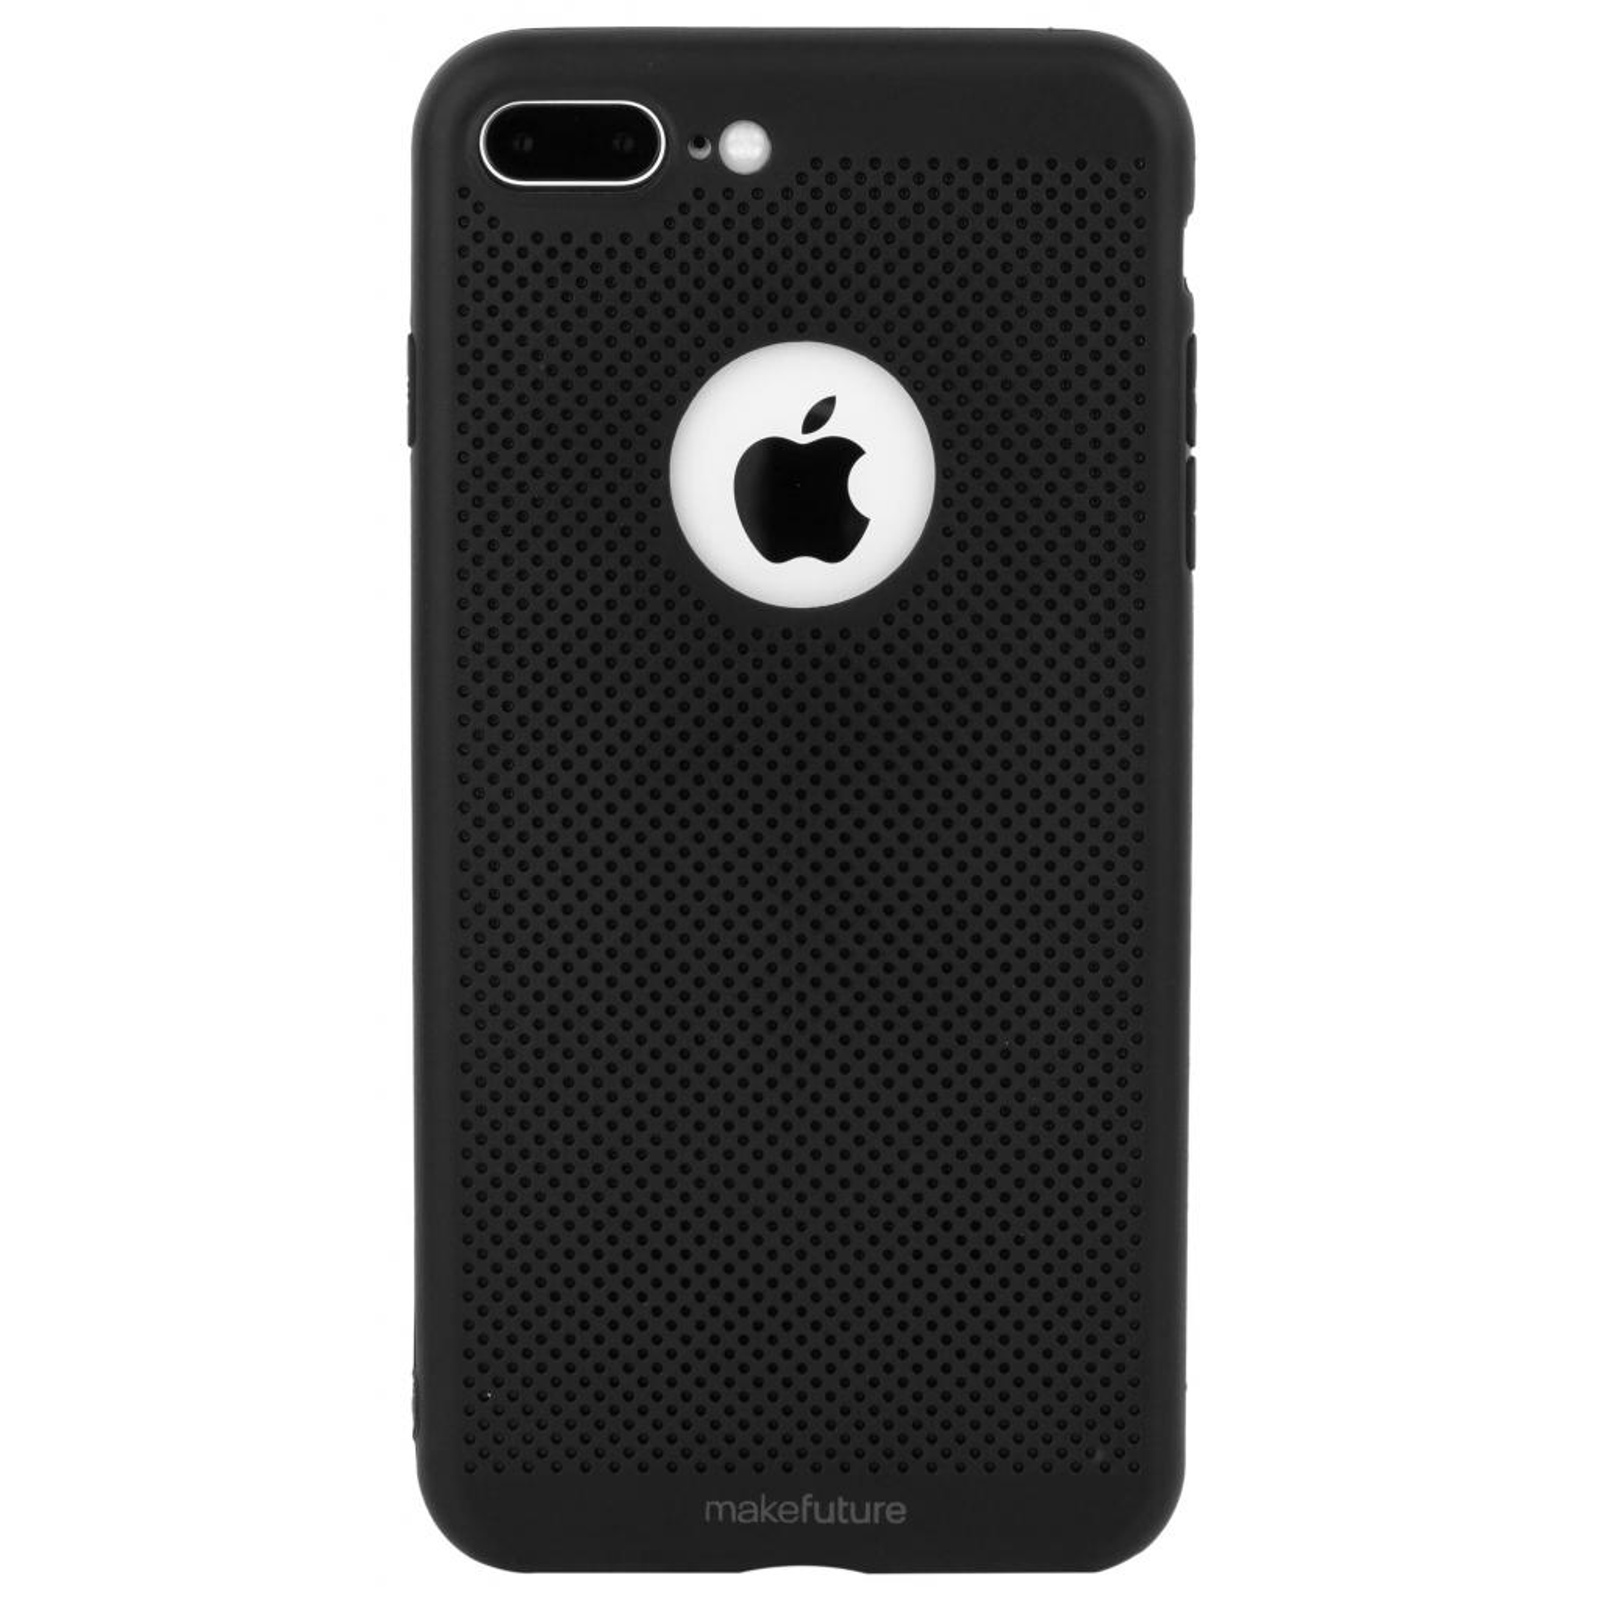 Чехол для моб. телефона MakeFuture Moon Case (TPU) для Apple iPhone 8 Plus Black (MCM-AI8PBK)